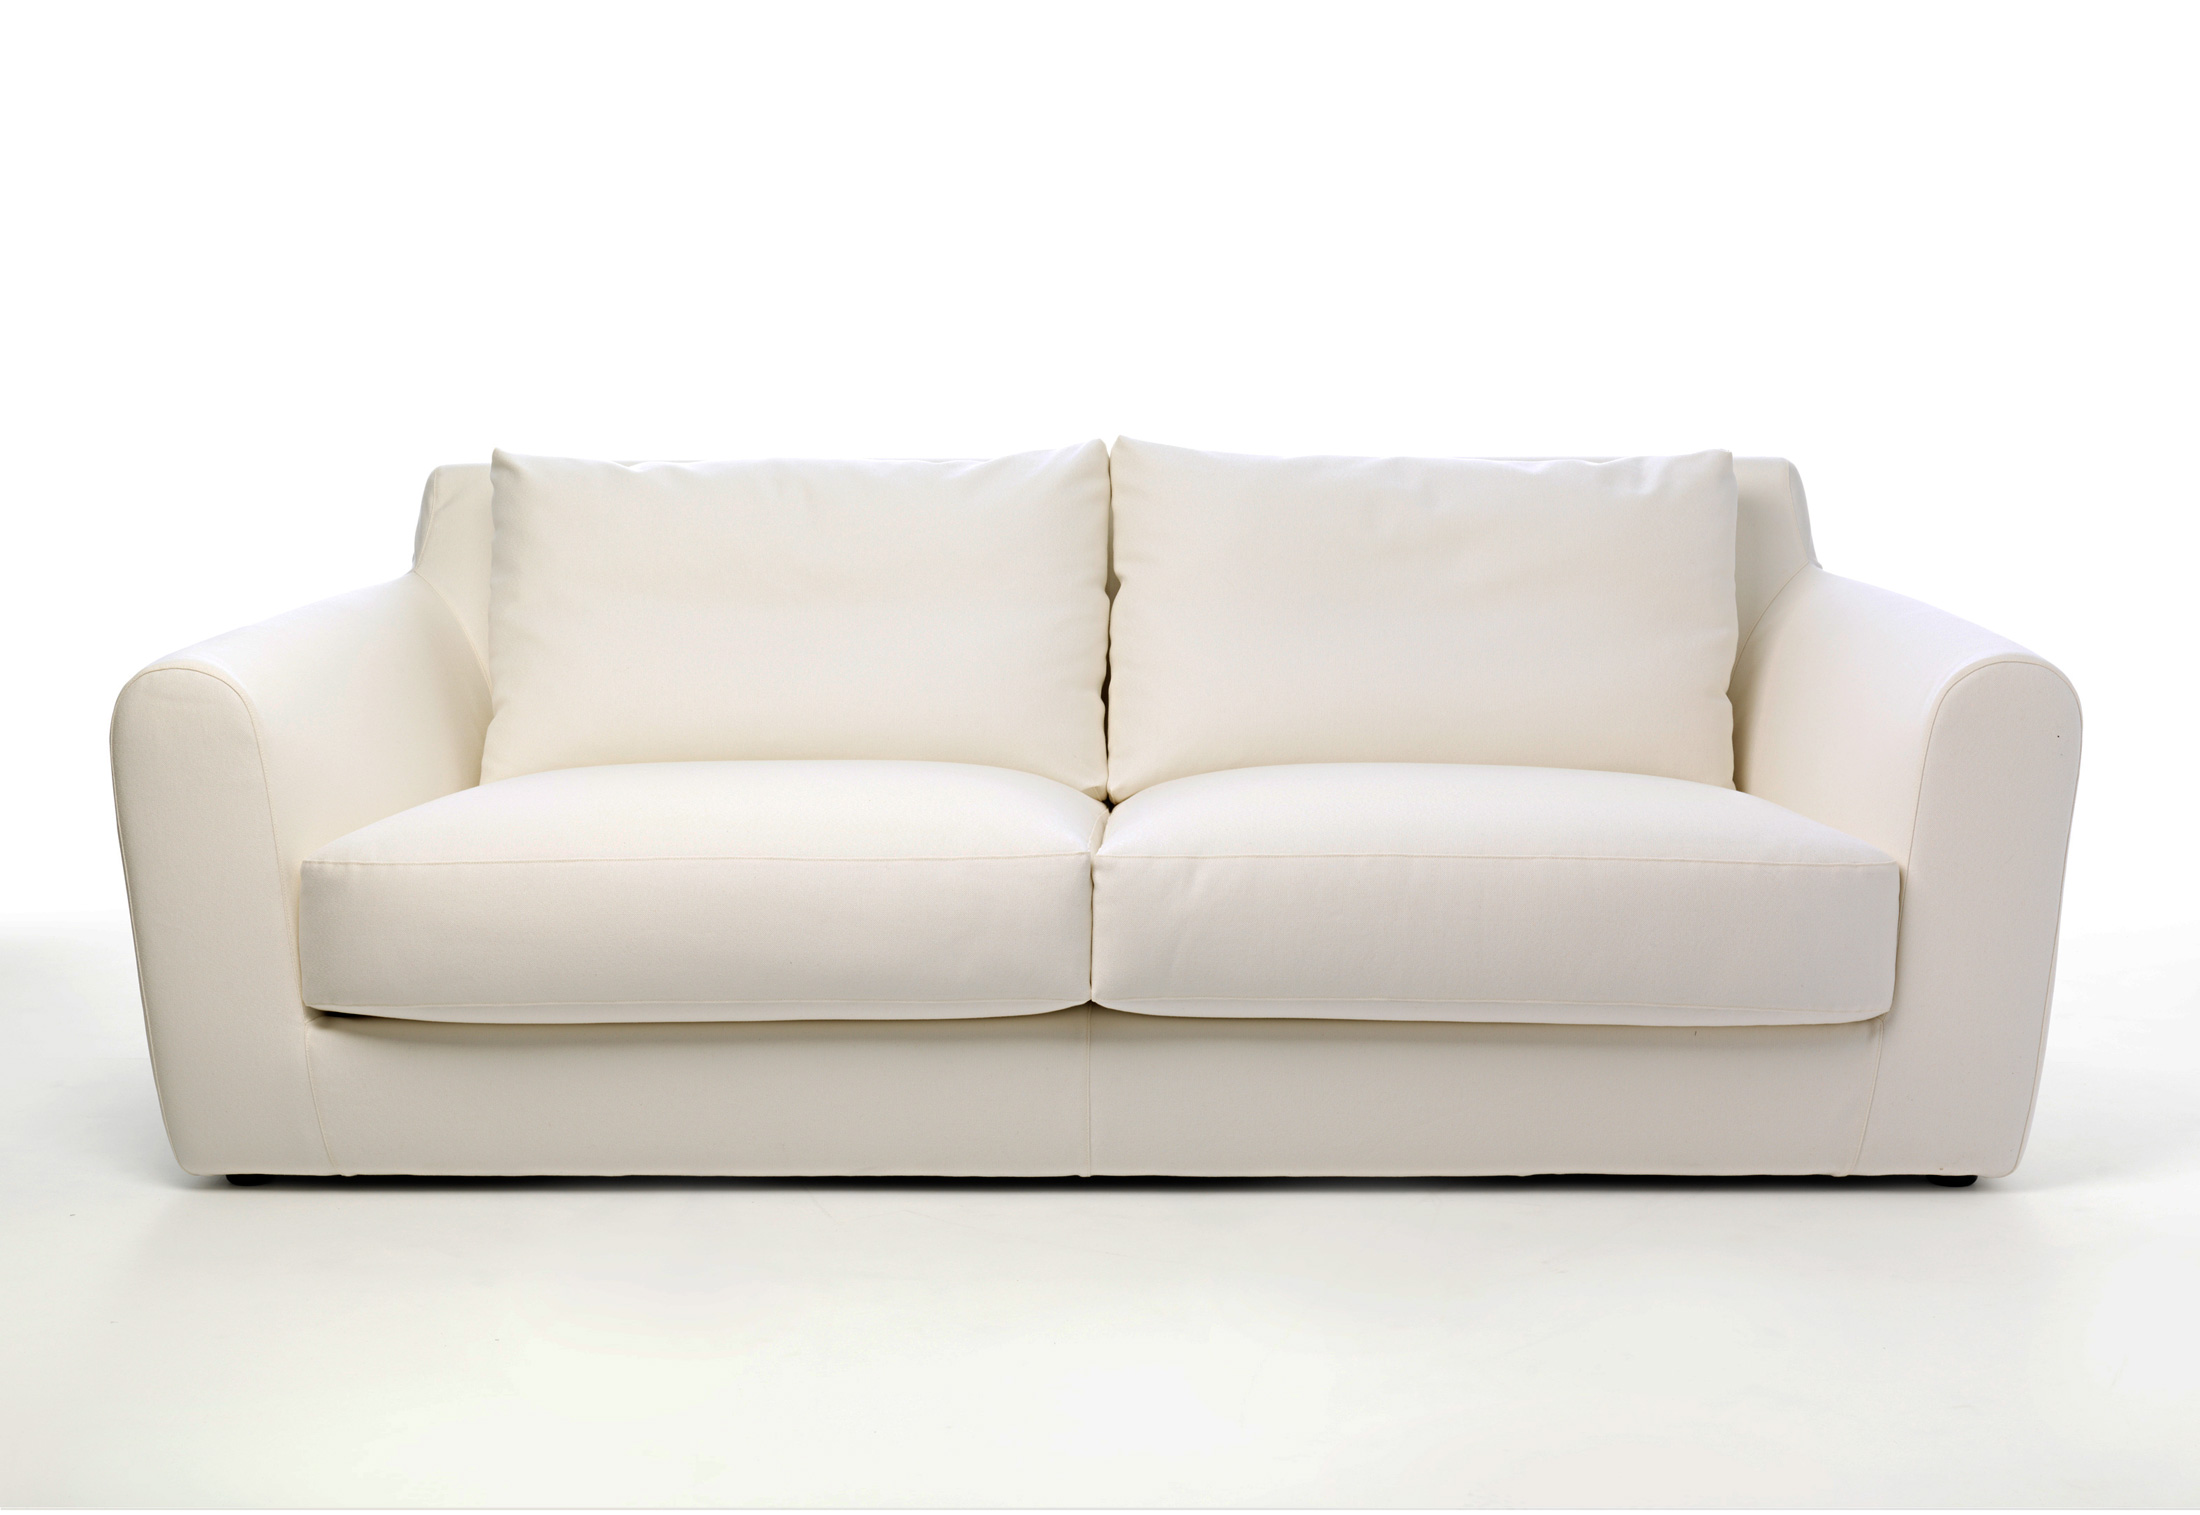 gran milano sofa gro von cerruti baleri stylepark. Black Bedroom Furniture Sets. Home Design Ideas